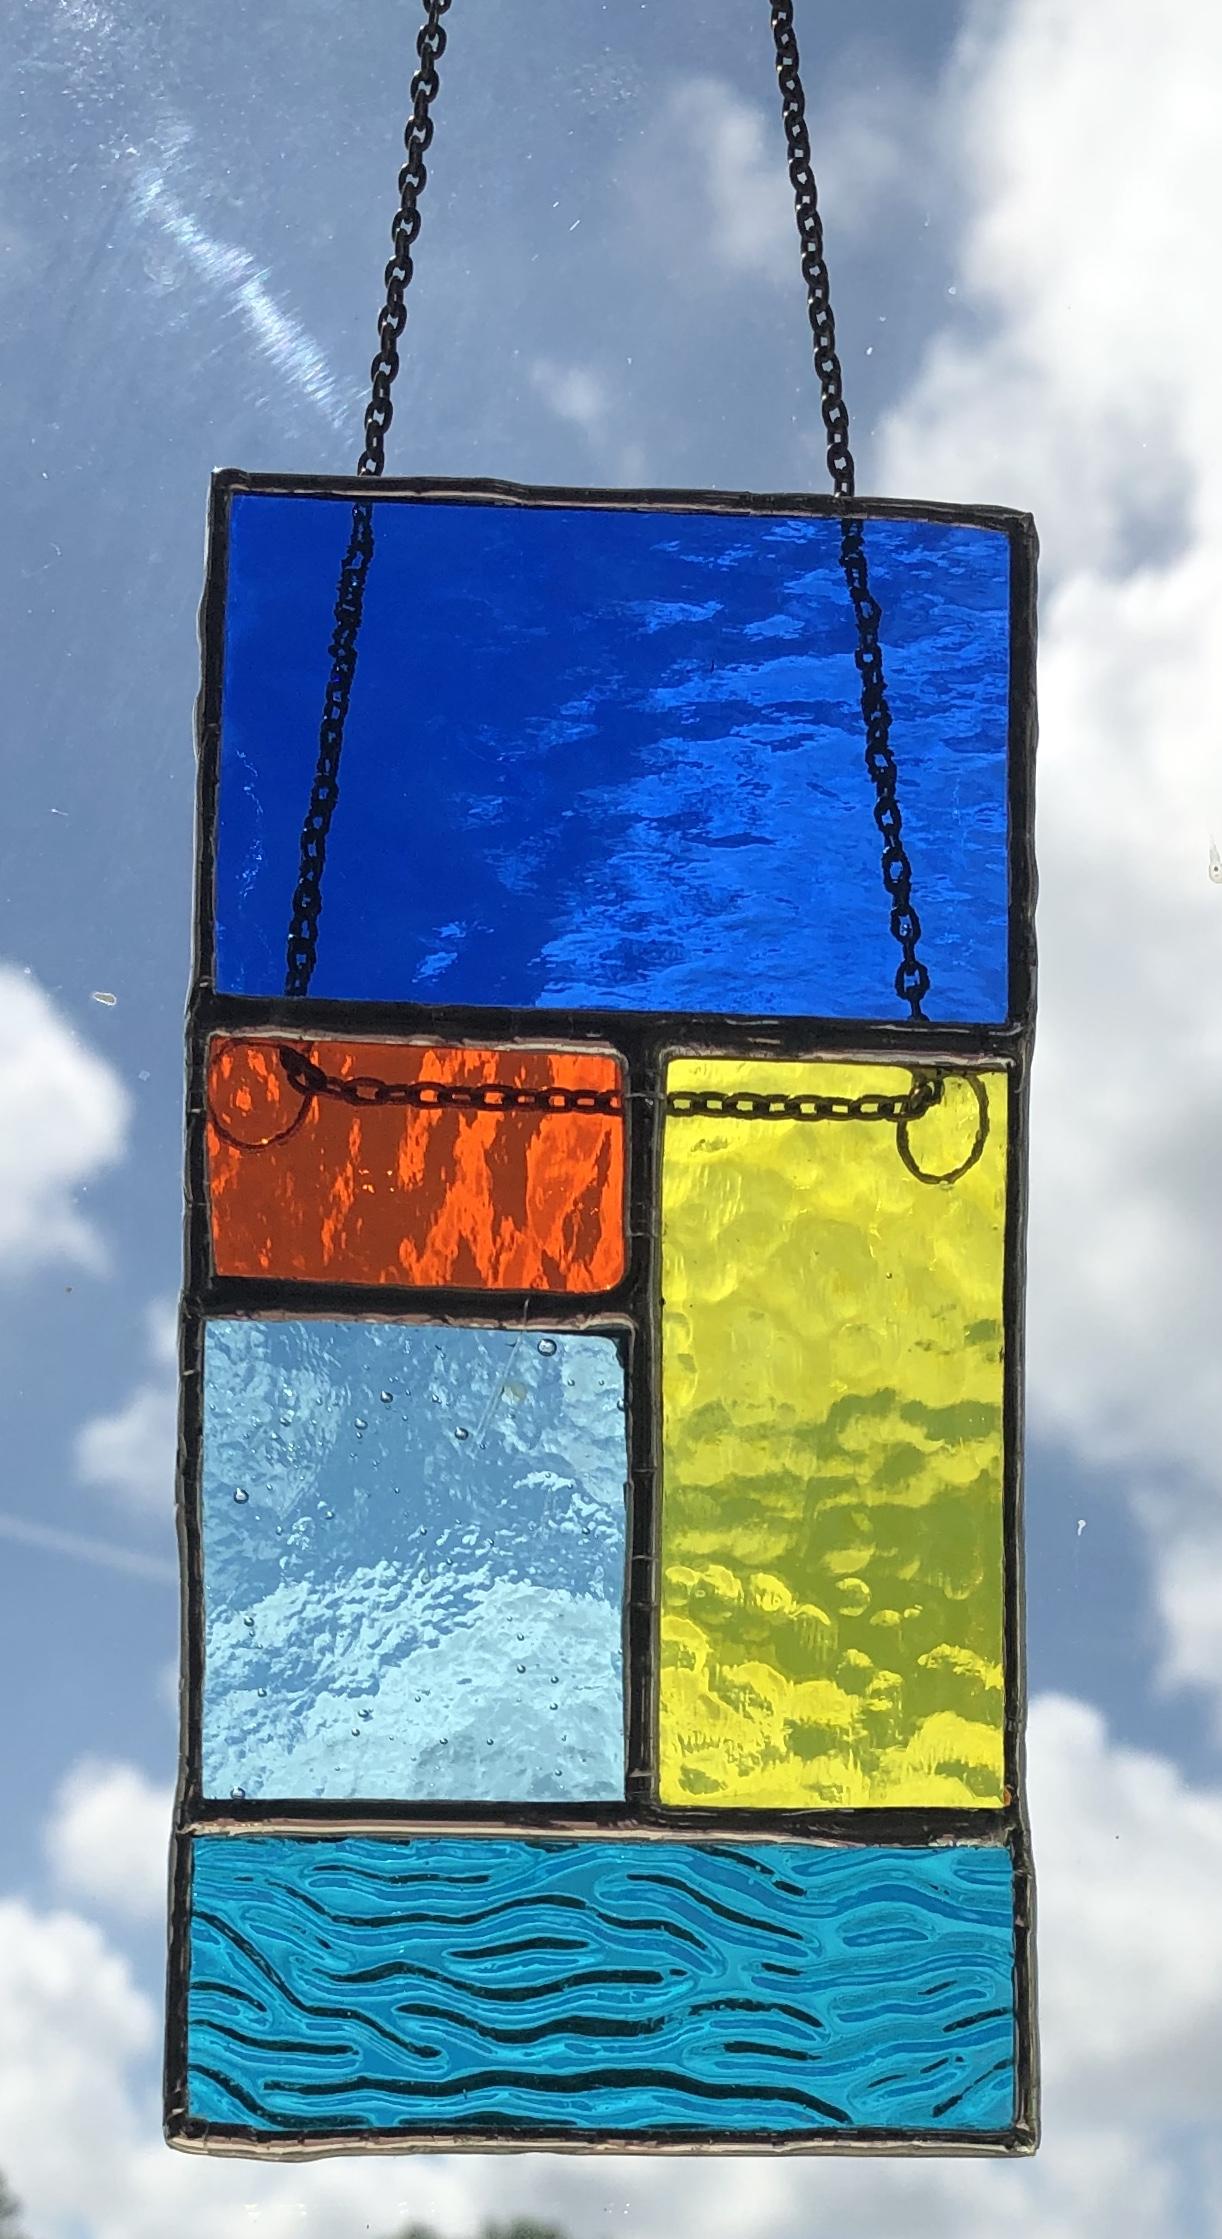 Multicolour abstract suncatcher